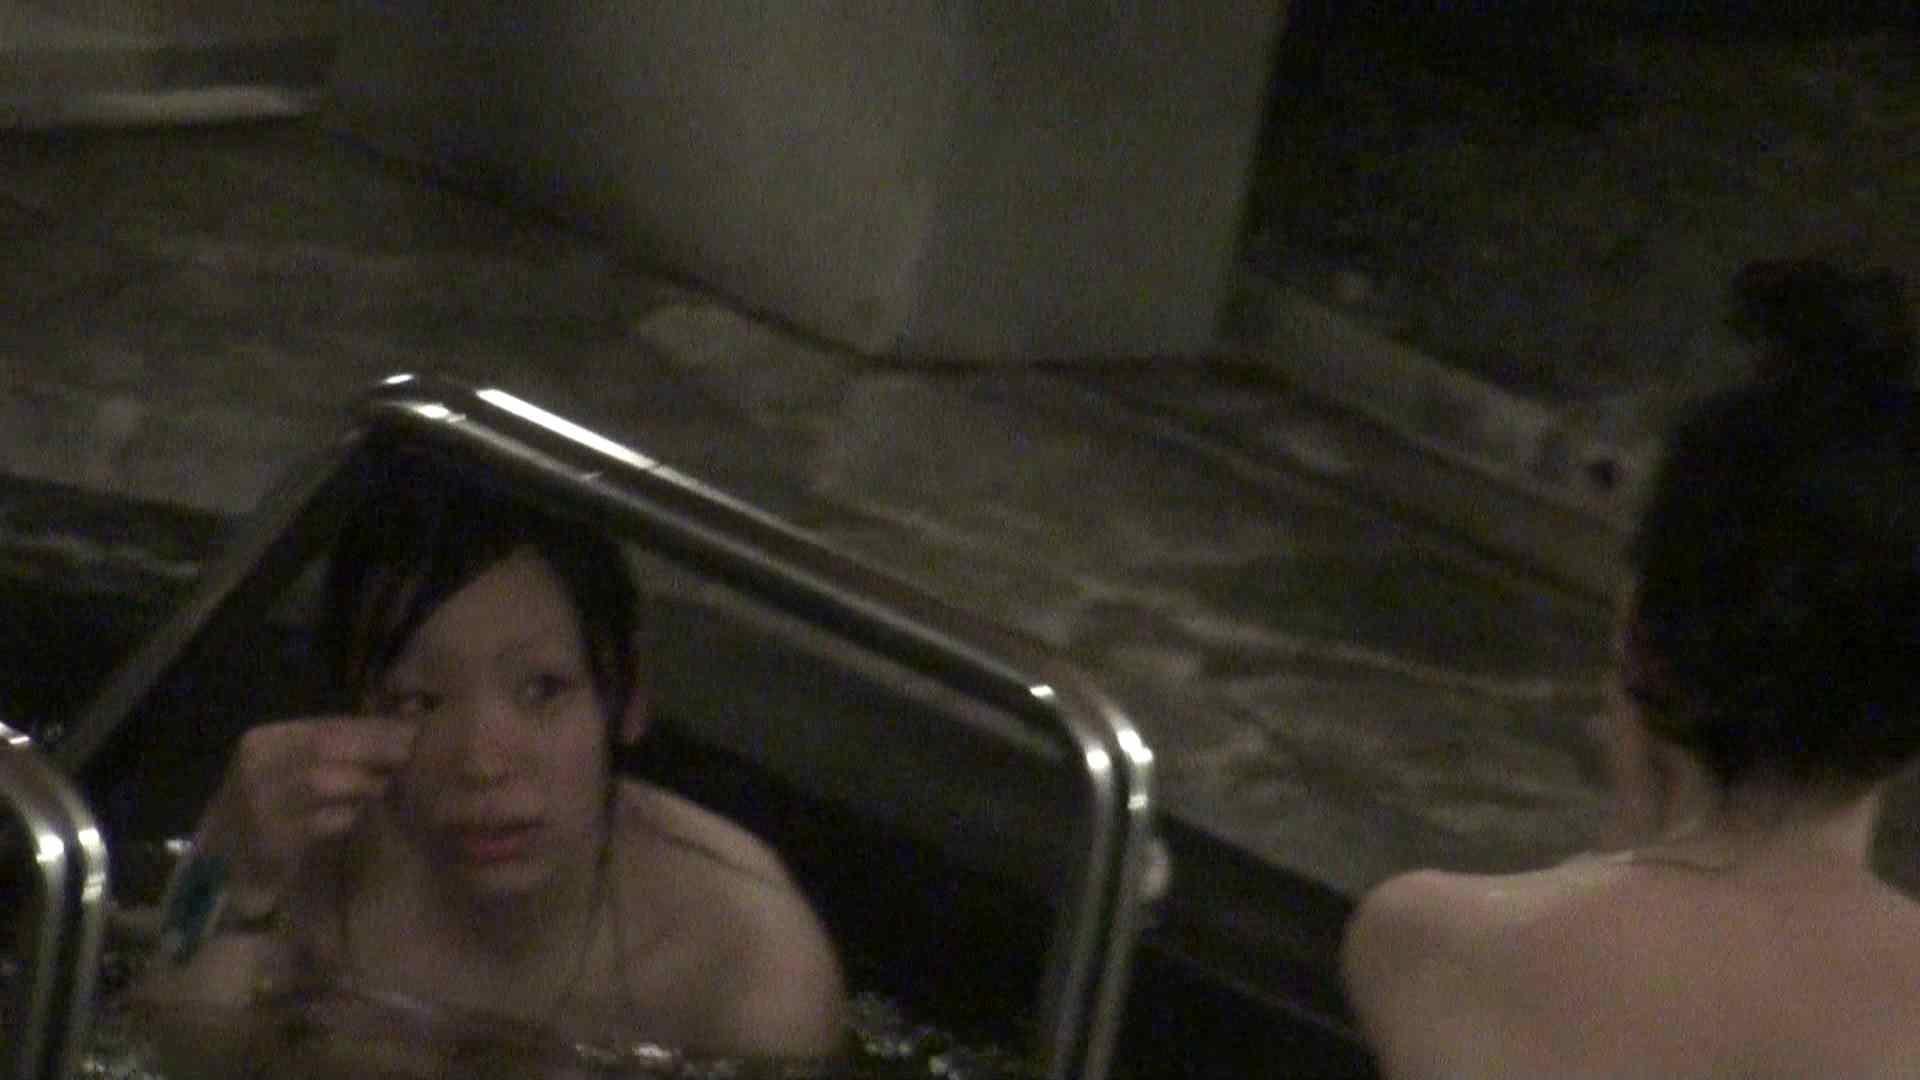 Aquaな露天風呂Vol.383 露天風呂編  81PIX 10